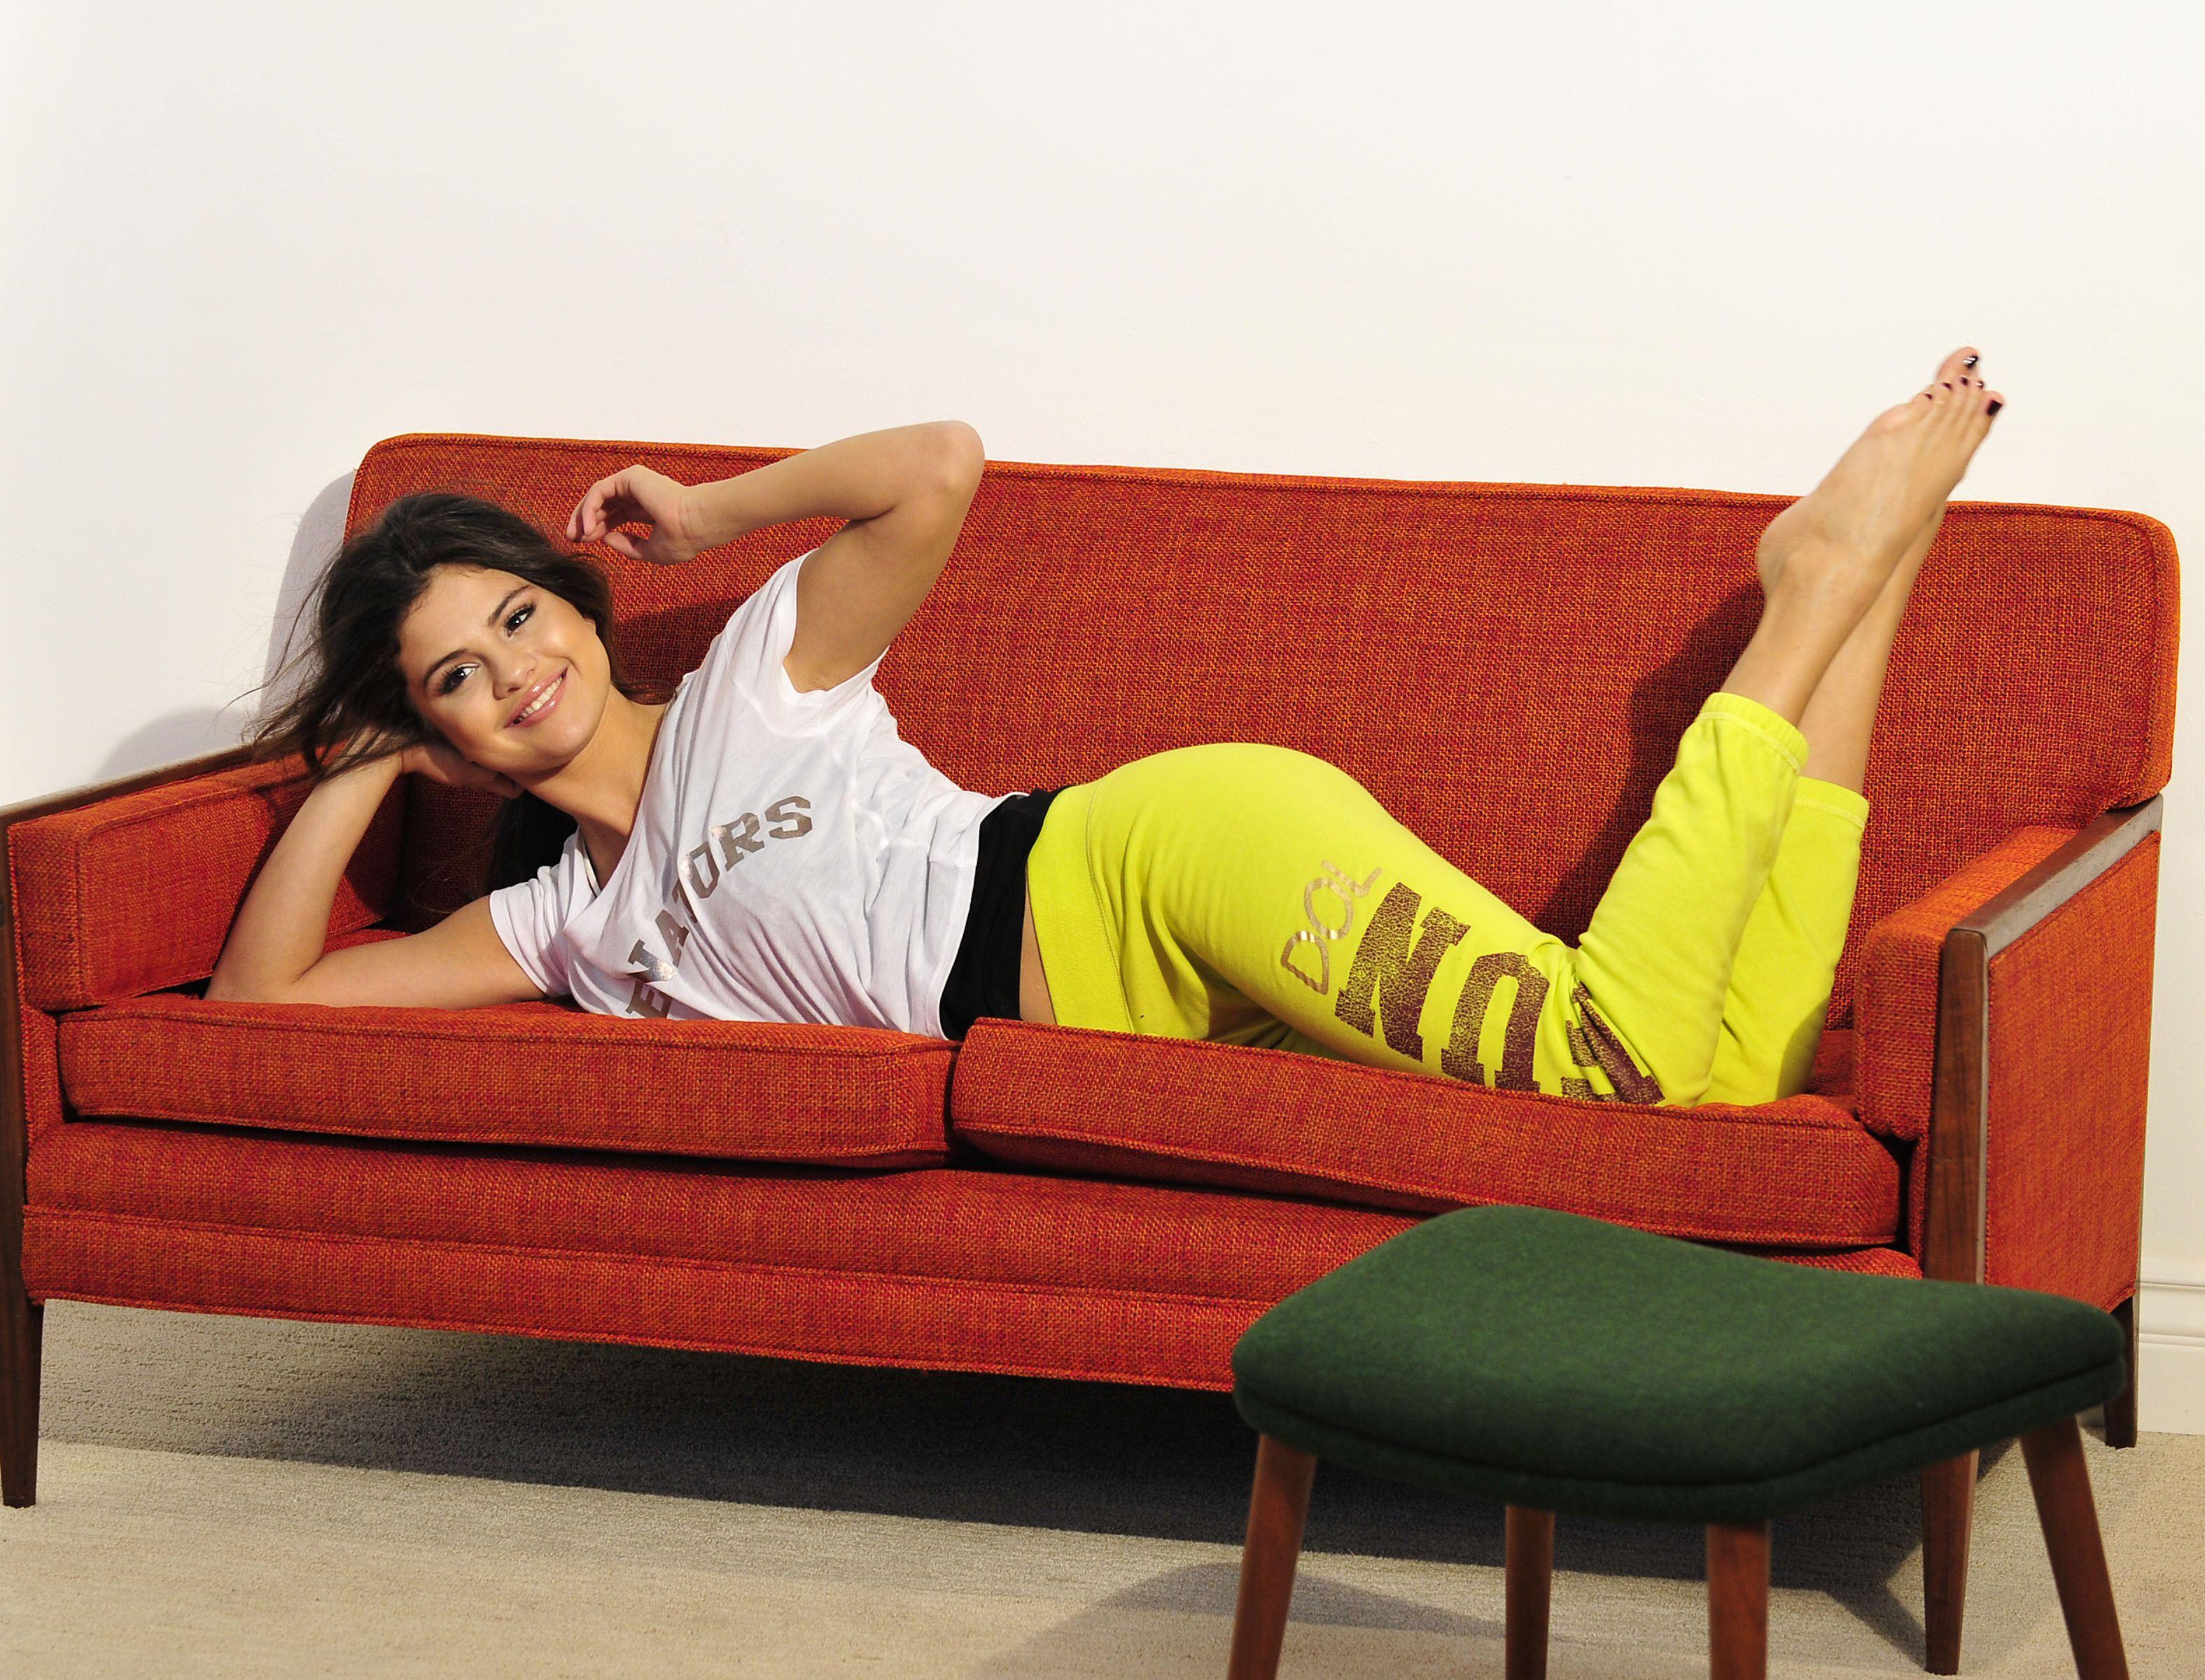 Selena Gomez Feet 1389576 Jpg 3 150 2 400 P Xeles Pieds Pinterest # Gabriela Gez Muebles